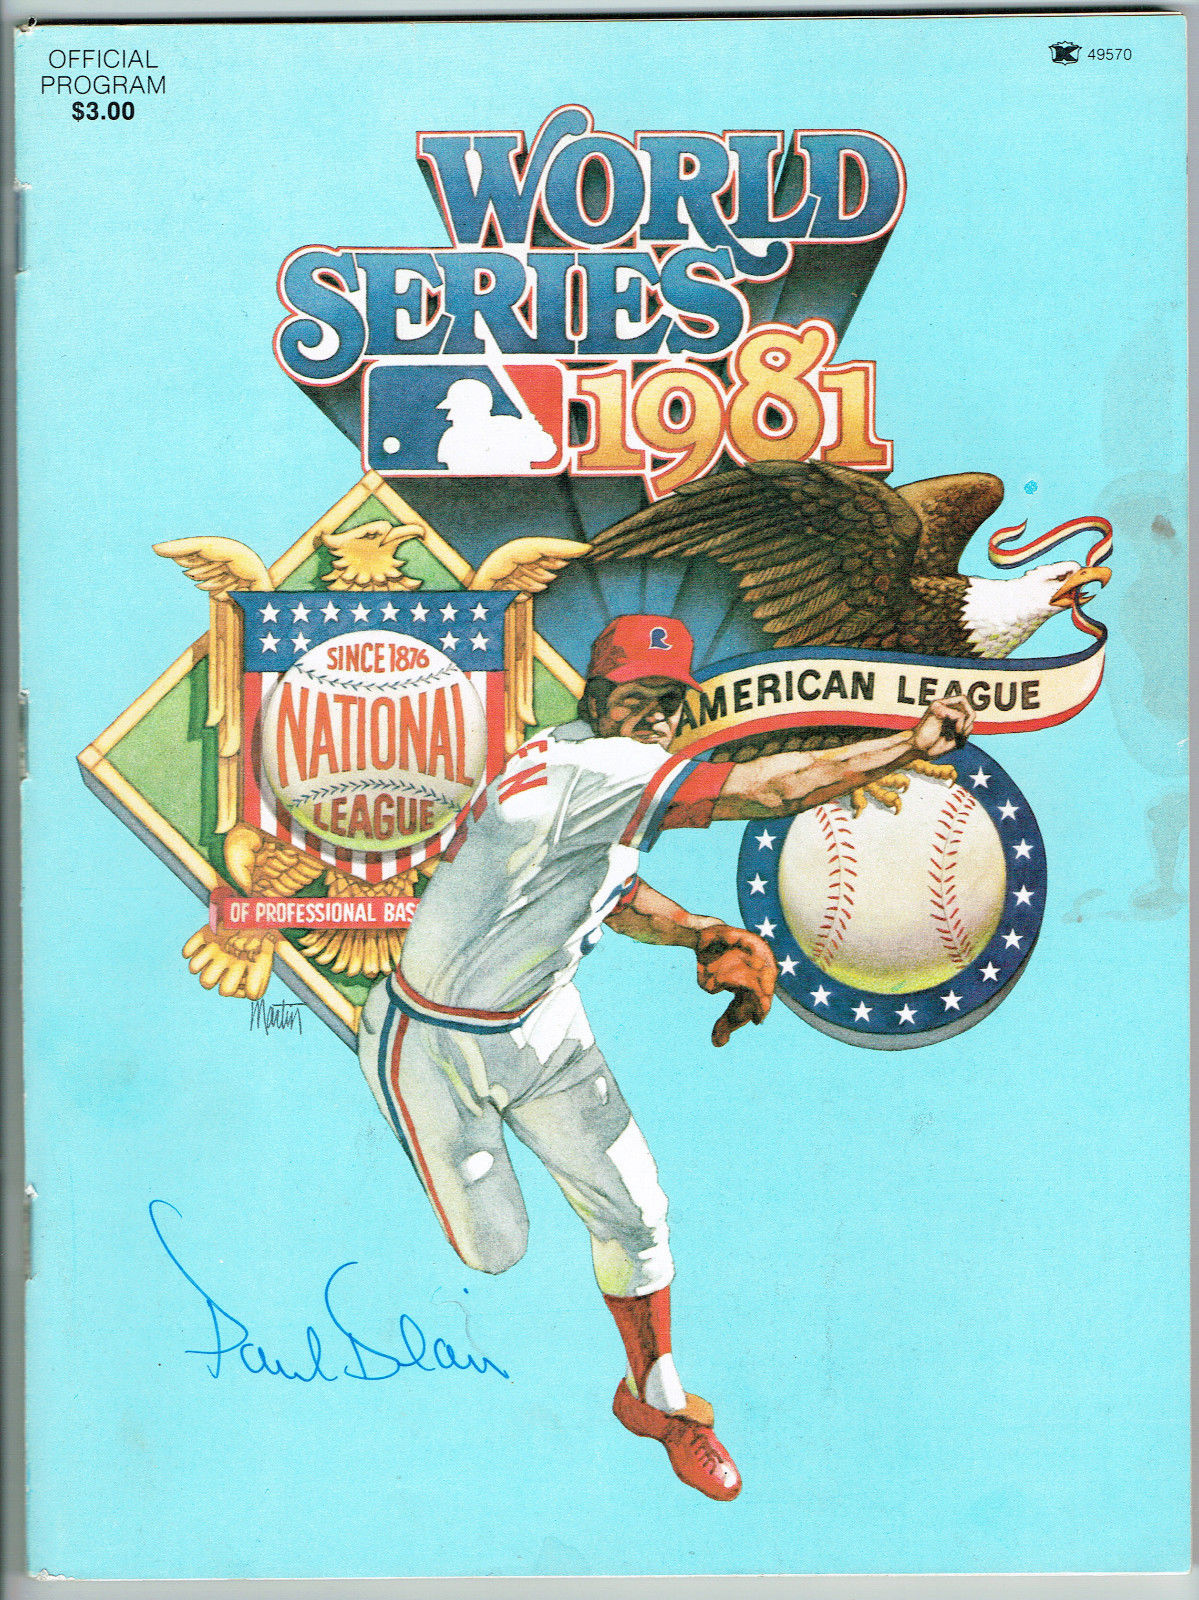 1981 World Series Program Signed by Paul Blair Auto COA